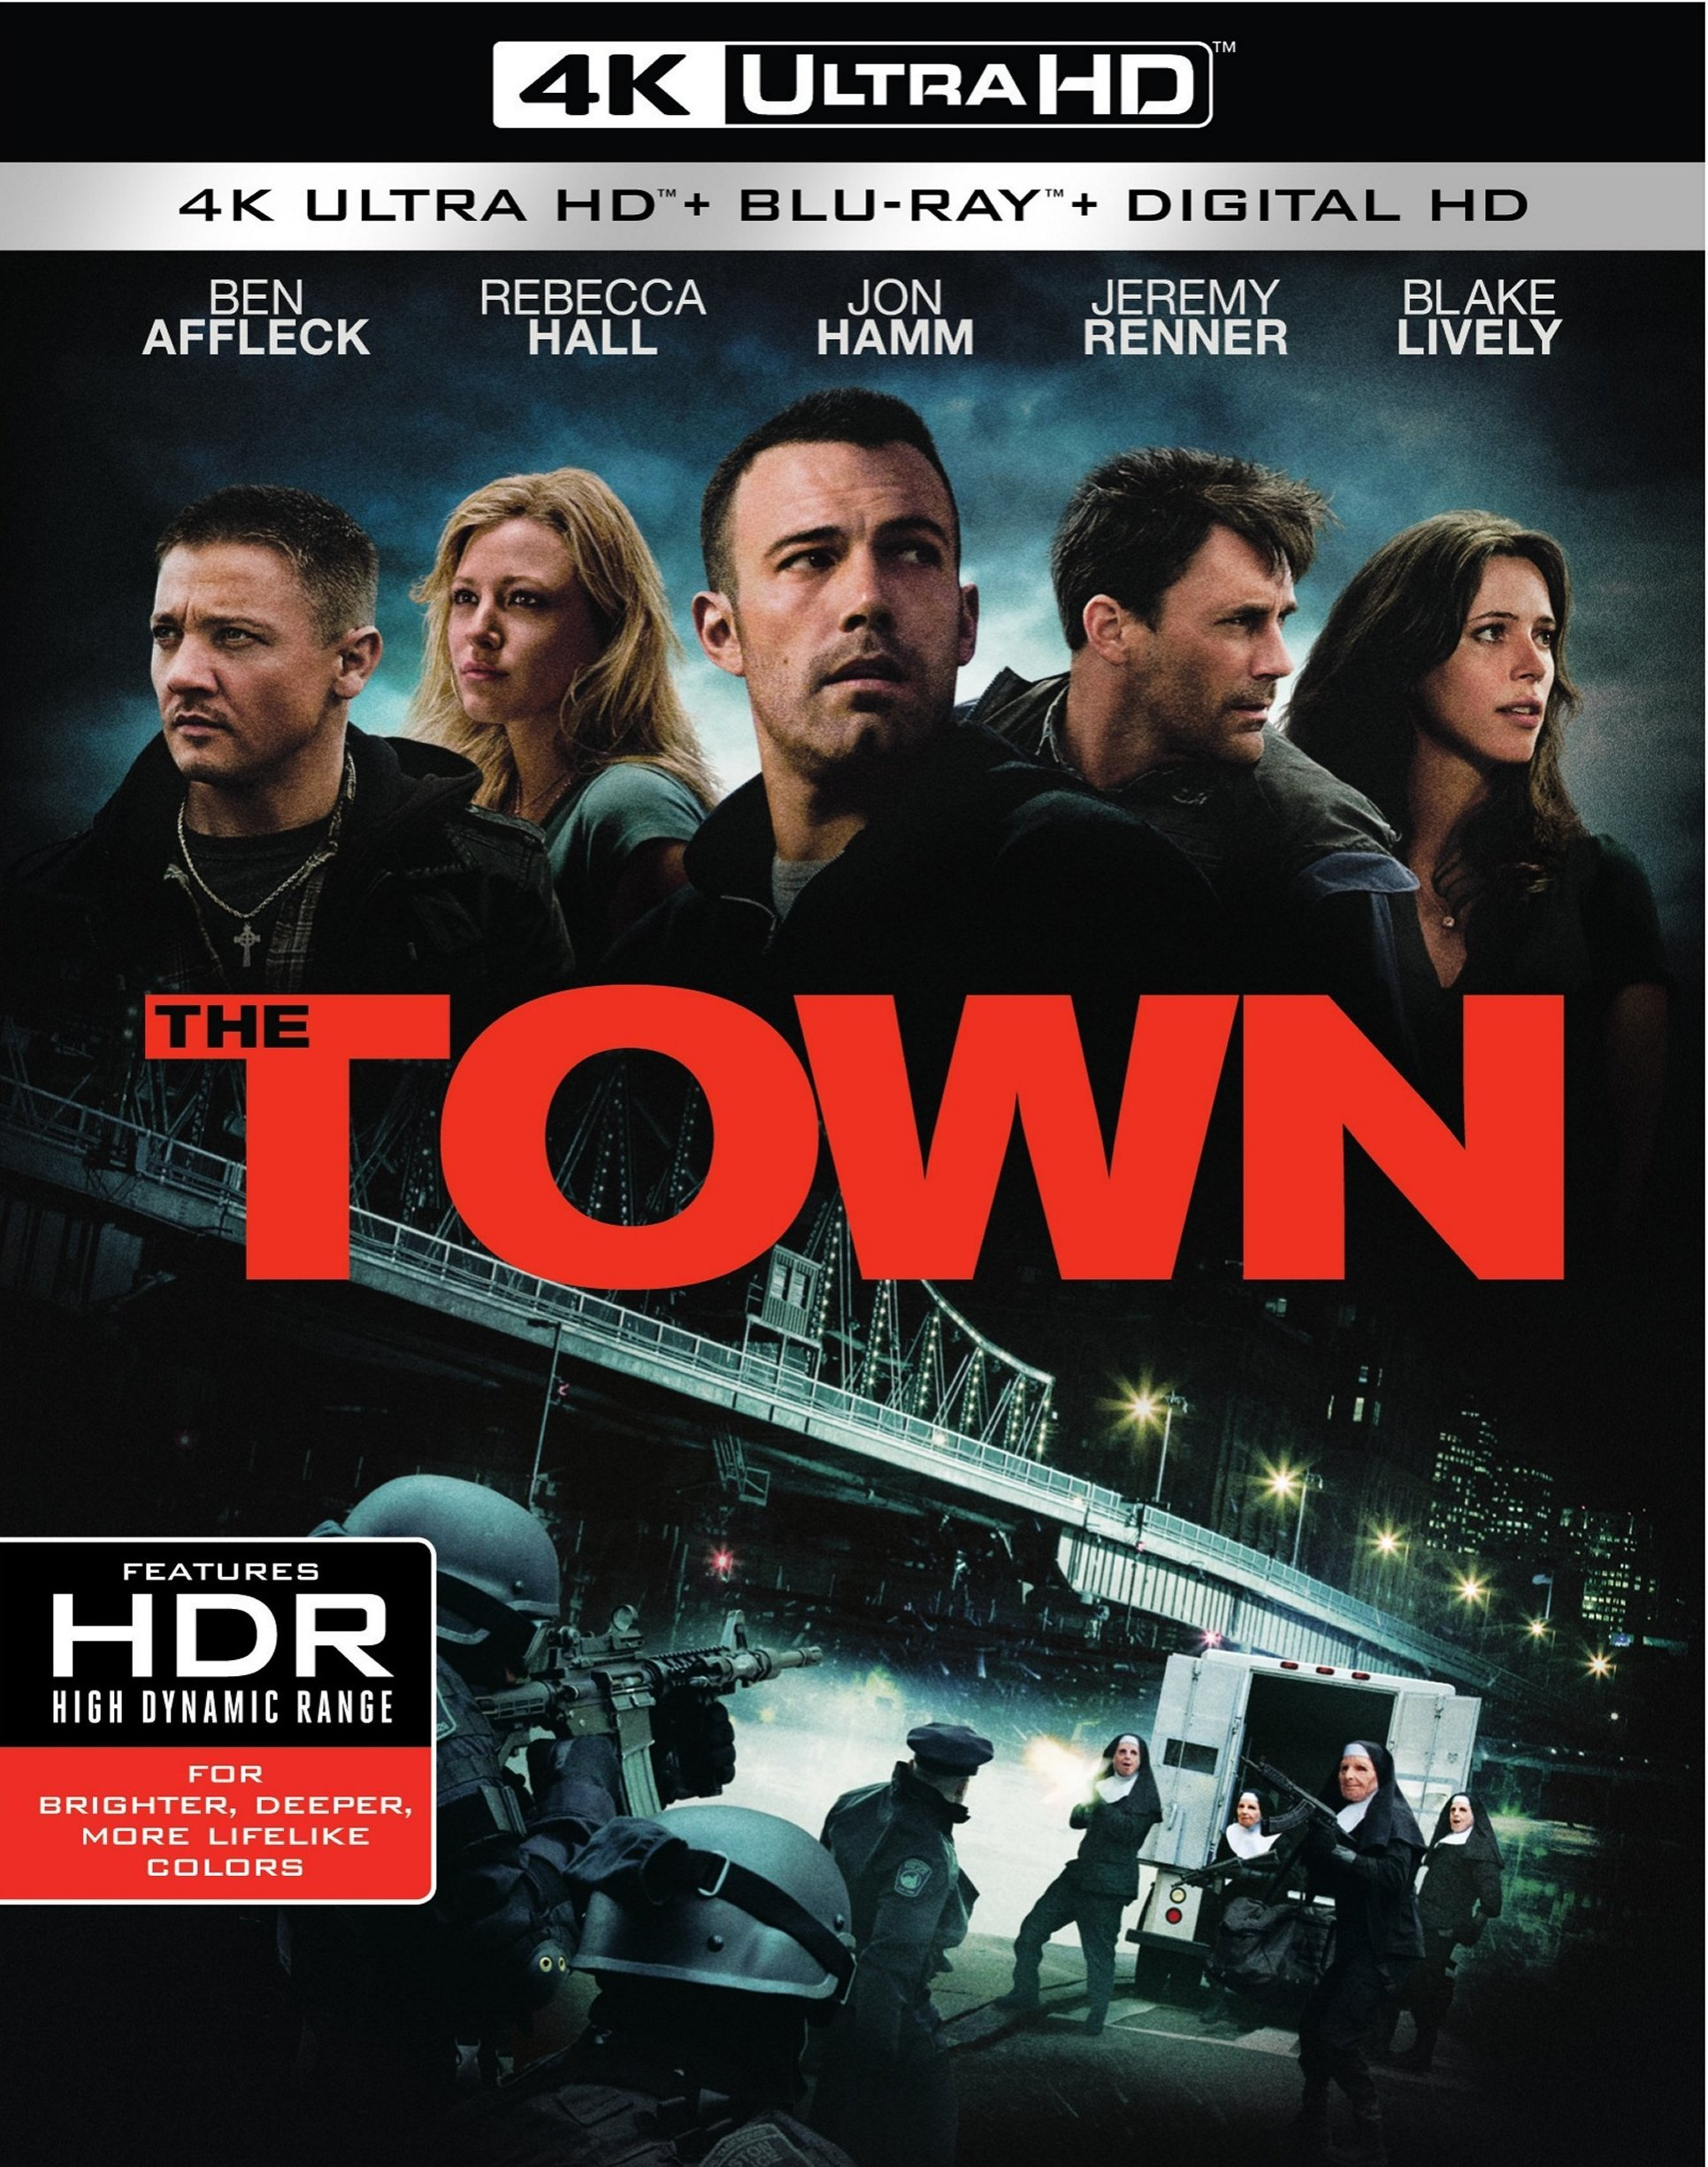 The Town 4K (2010) Ultra HD Blu-ray